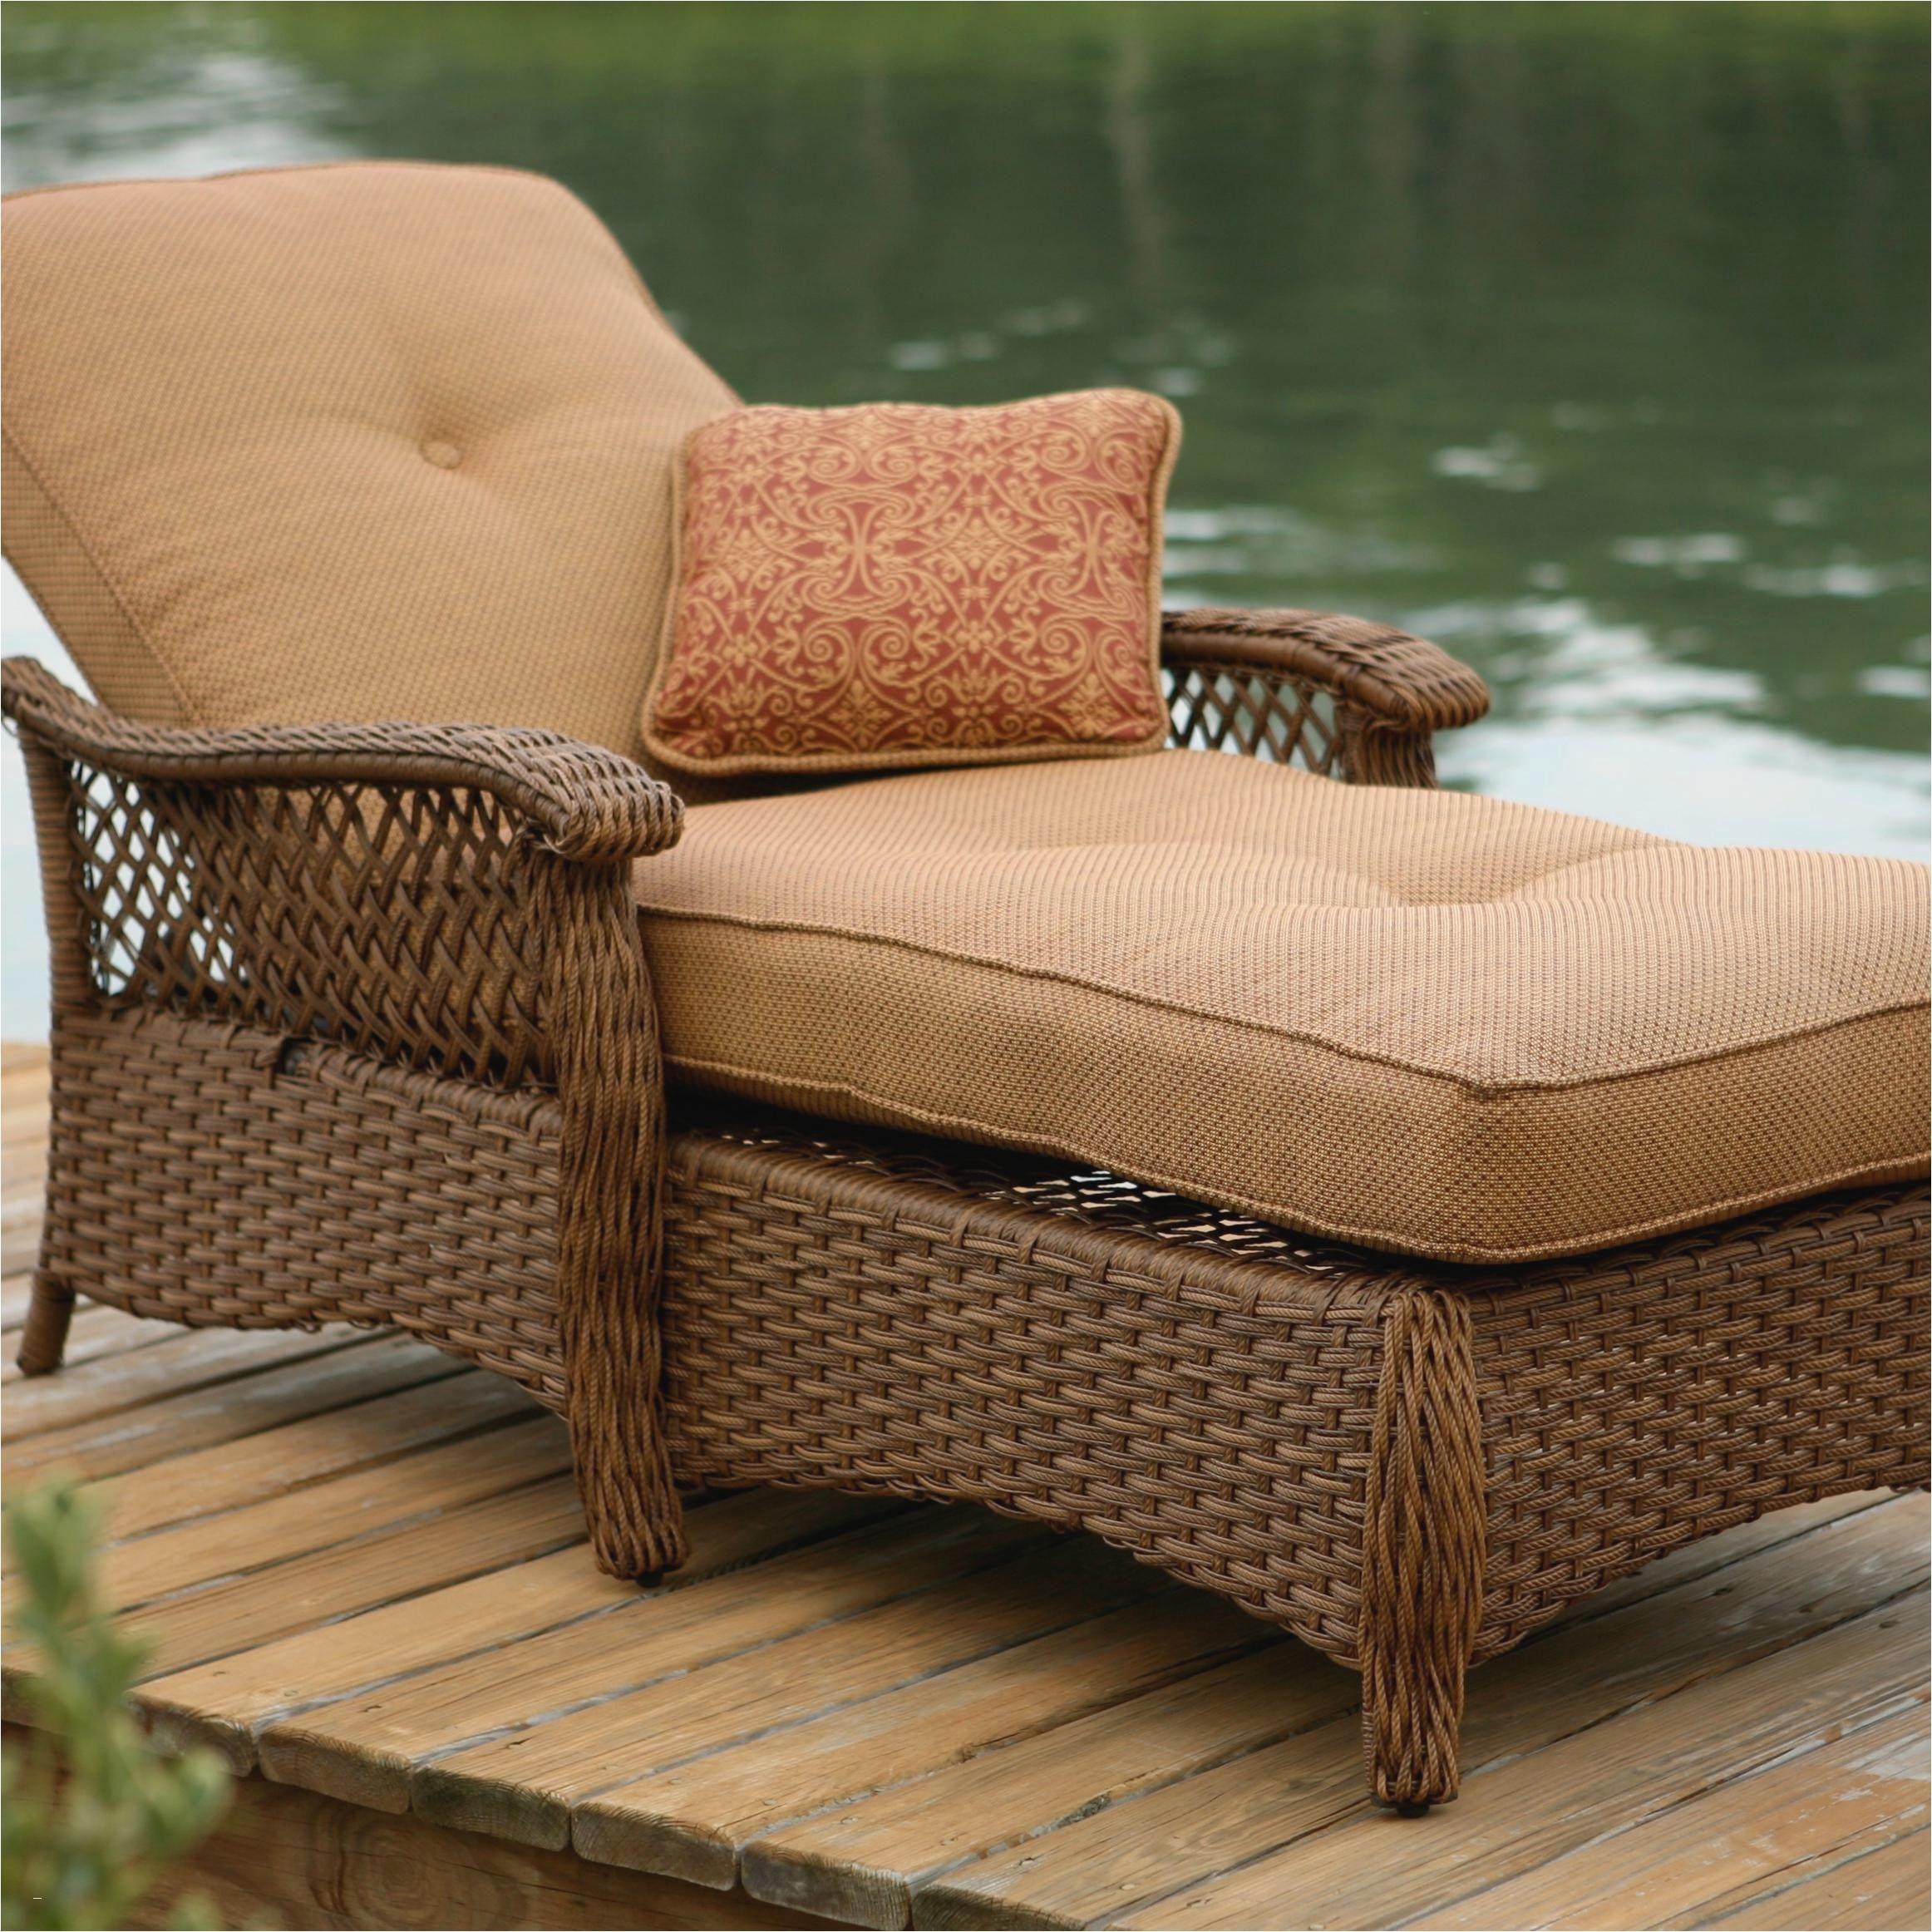 Bj S Furniture Unique 26 Bjs Outdoor Furniture Home Furniture Ideas